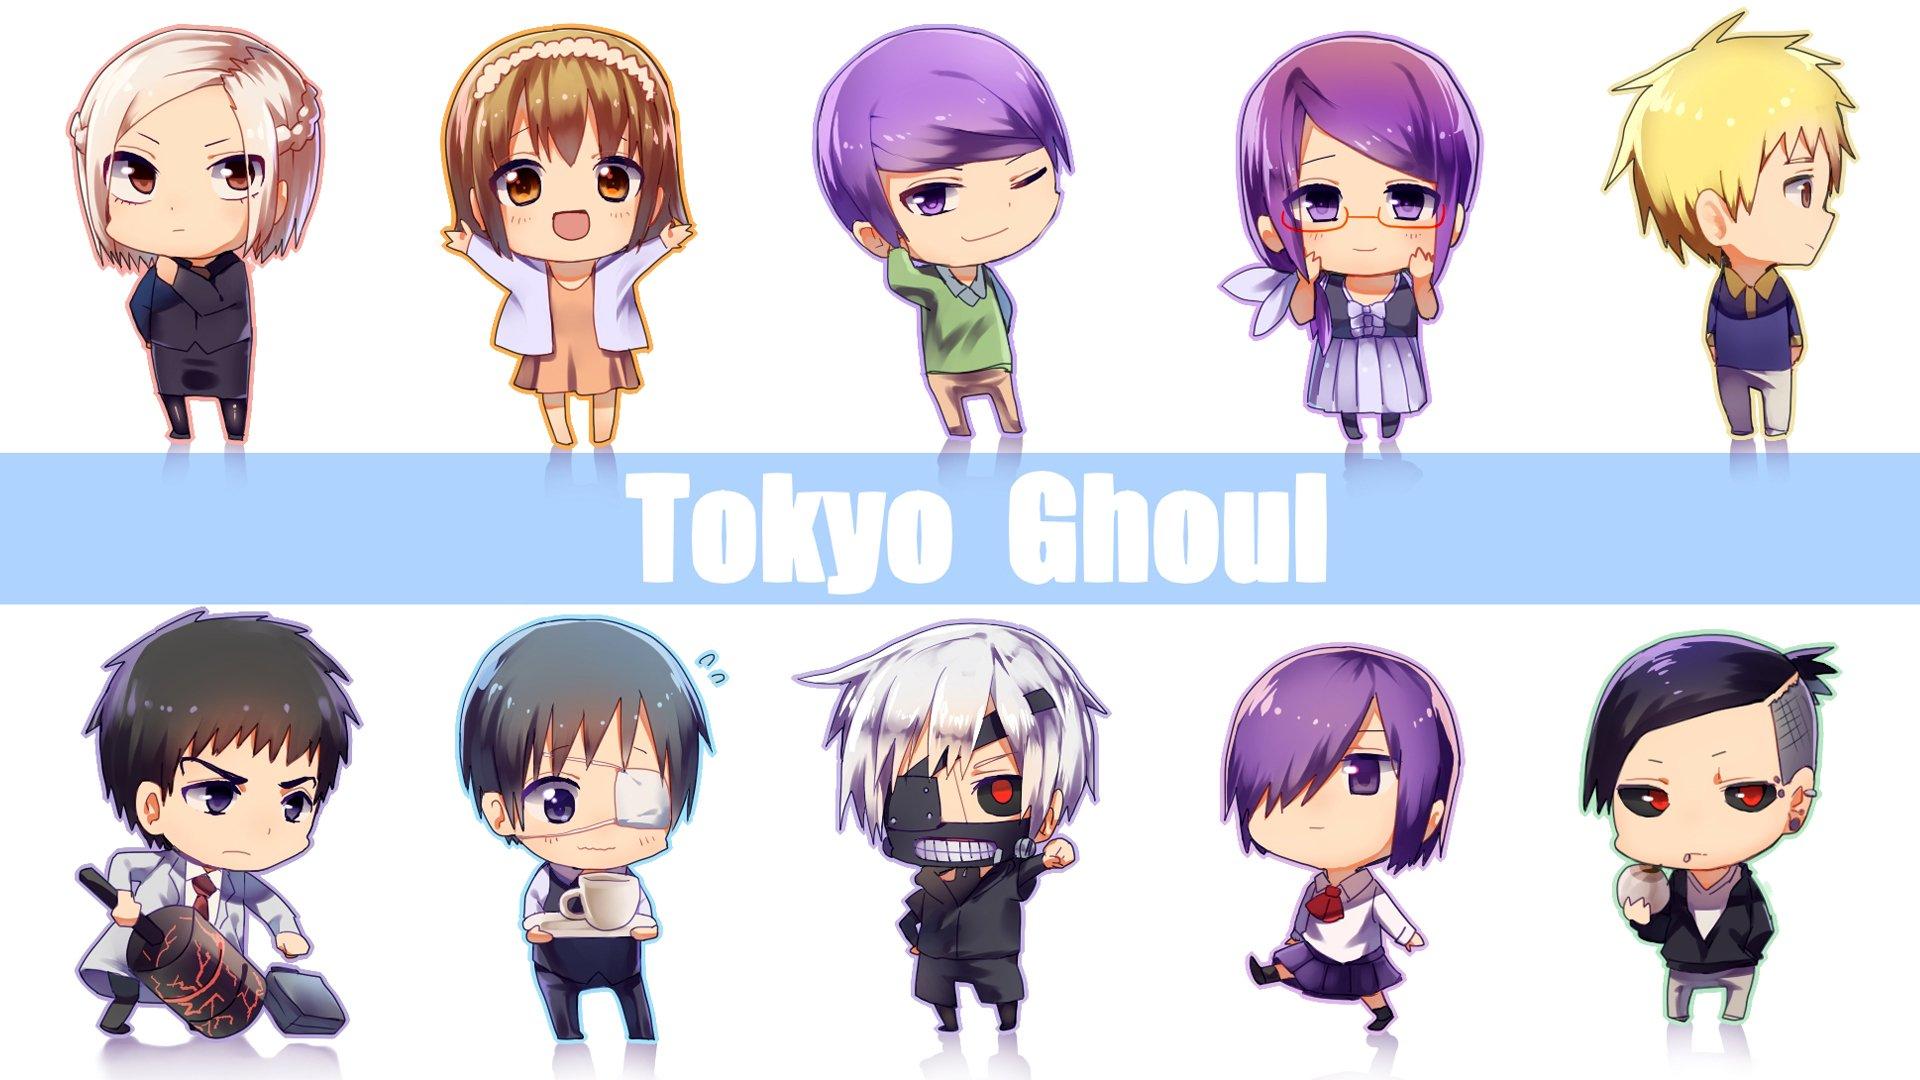 akira mado hd. Anime clipart tokyo ghoul